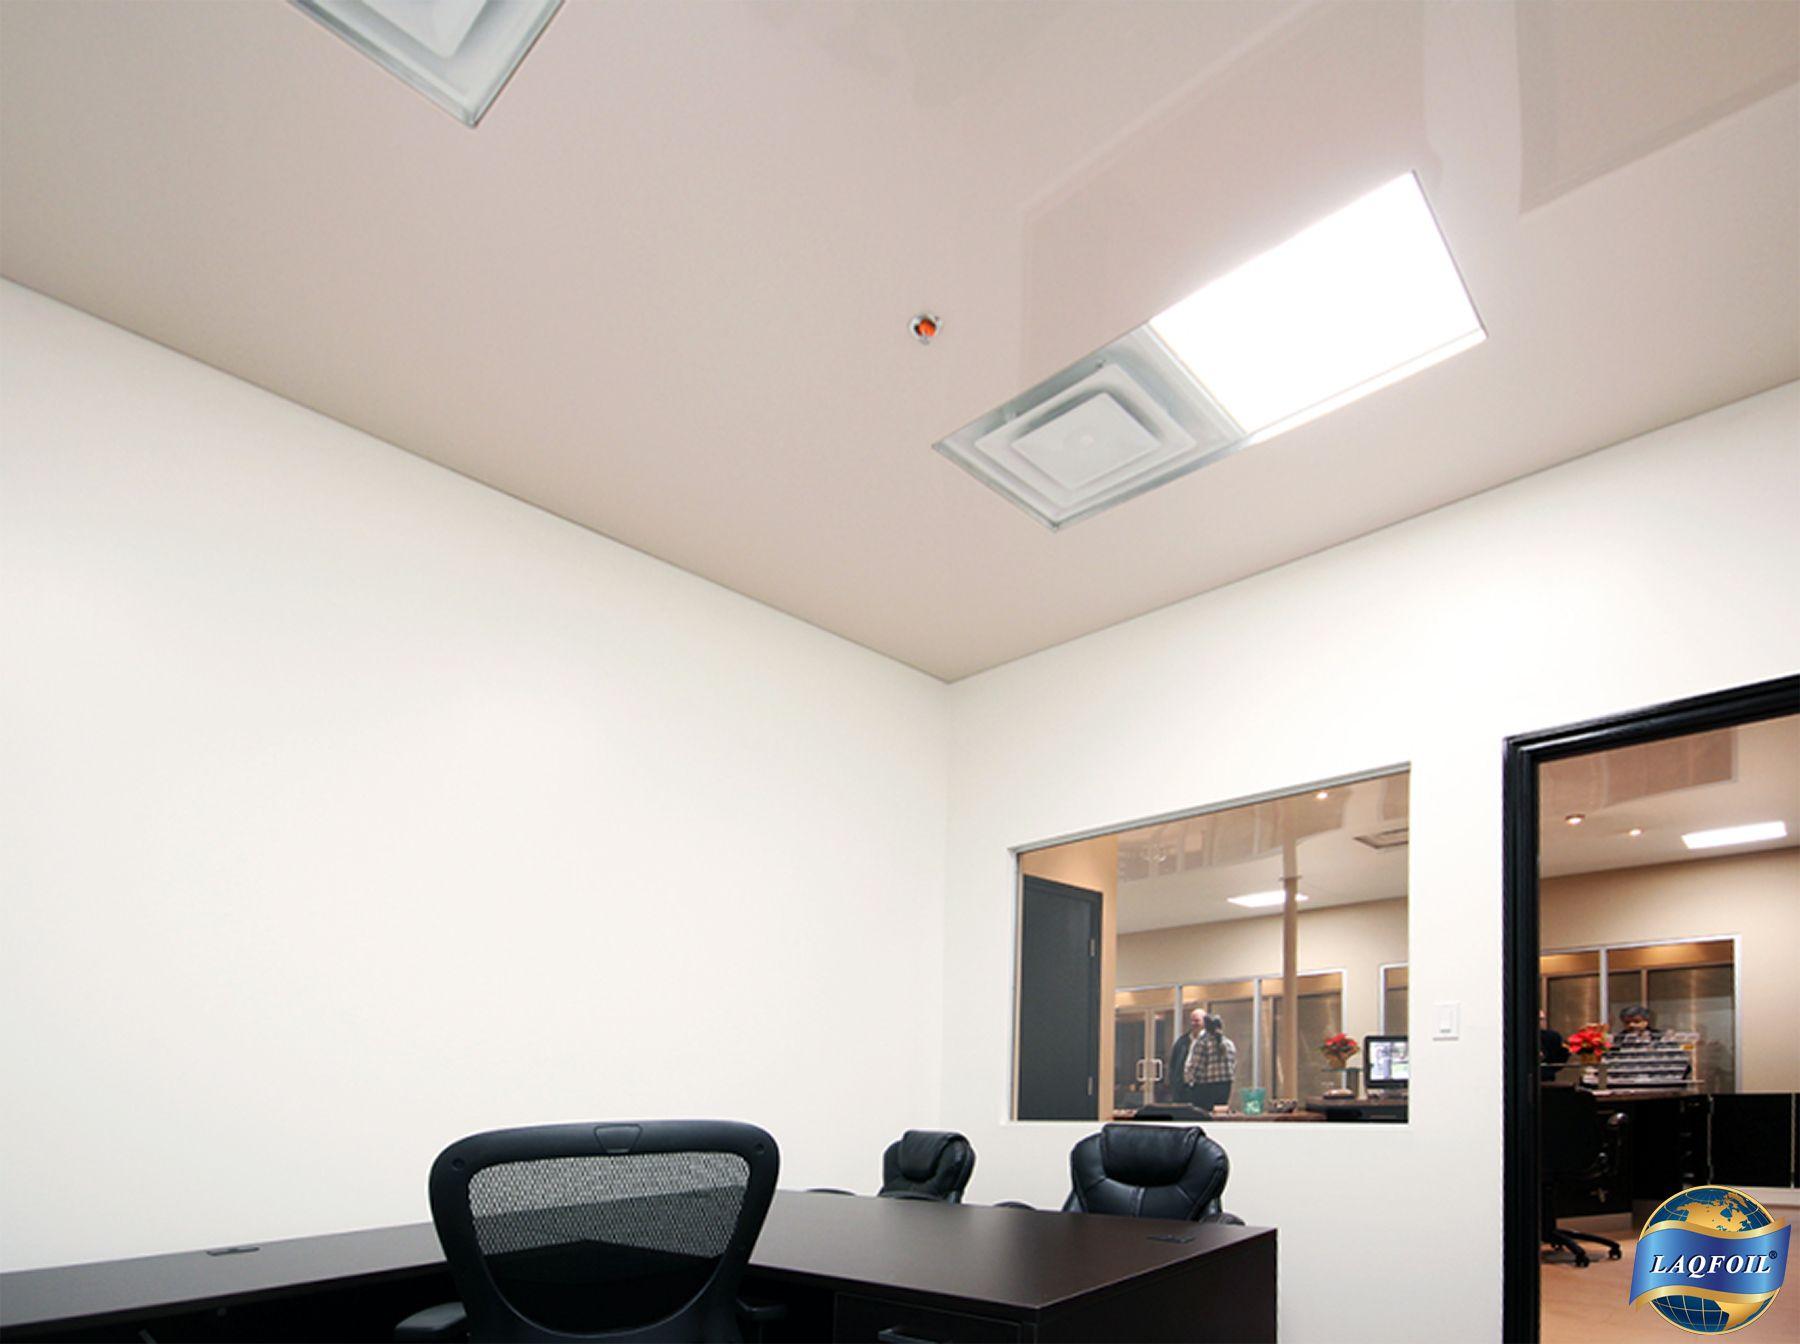 A Private Office At The Home U0026 Design Expo Center, Toronto, Ontario, Canada